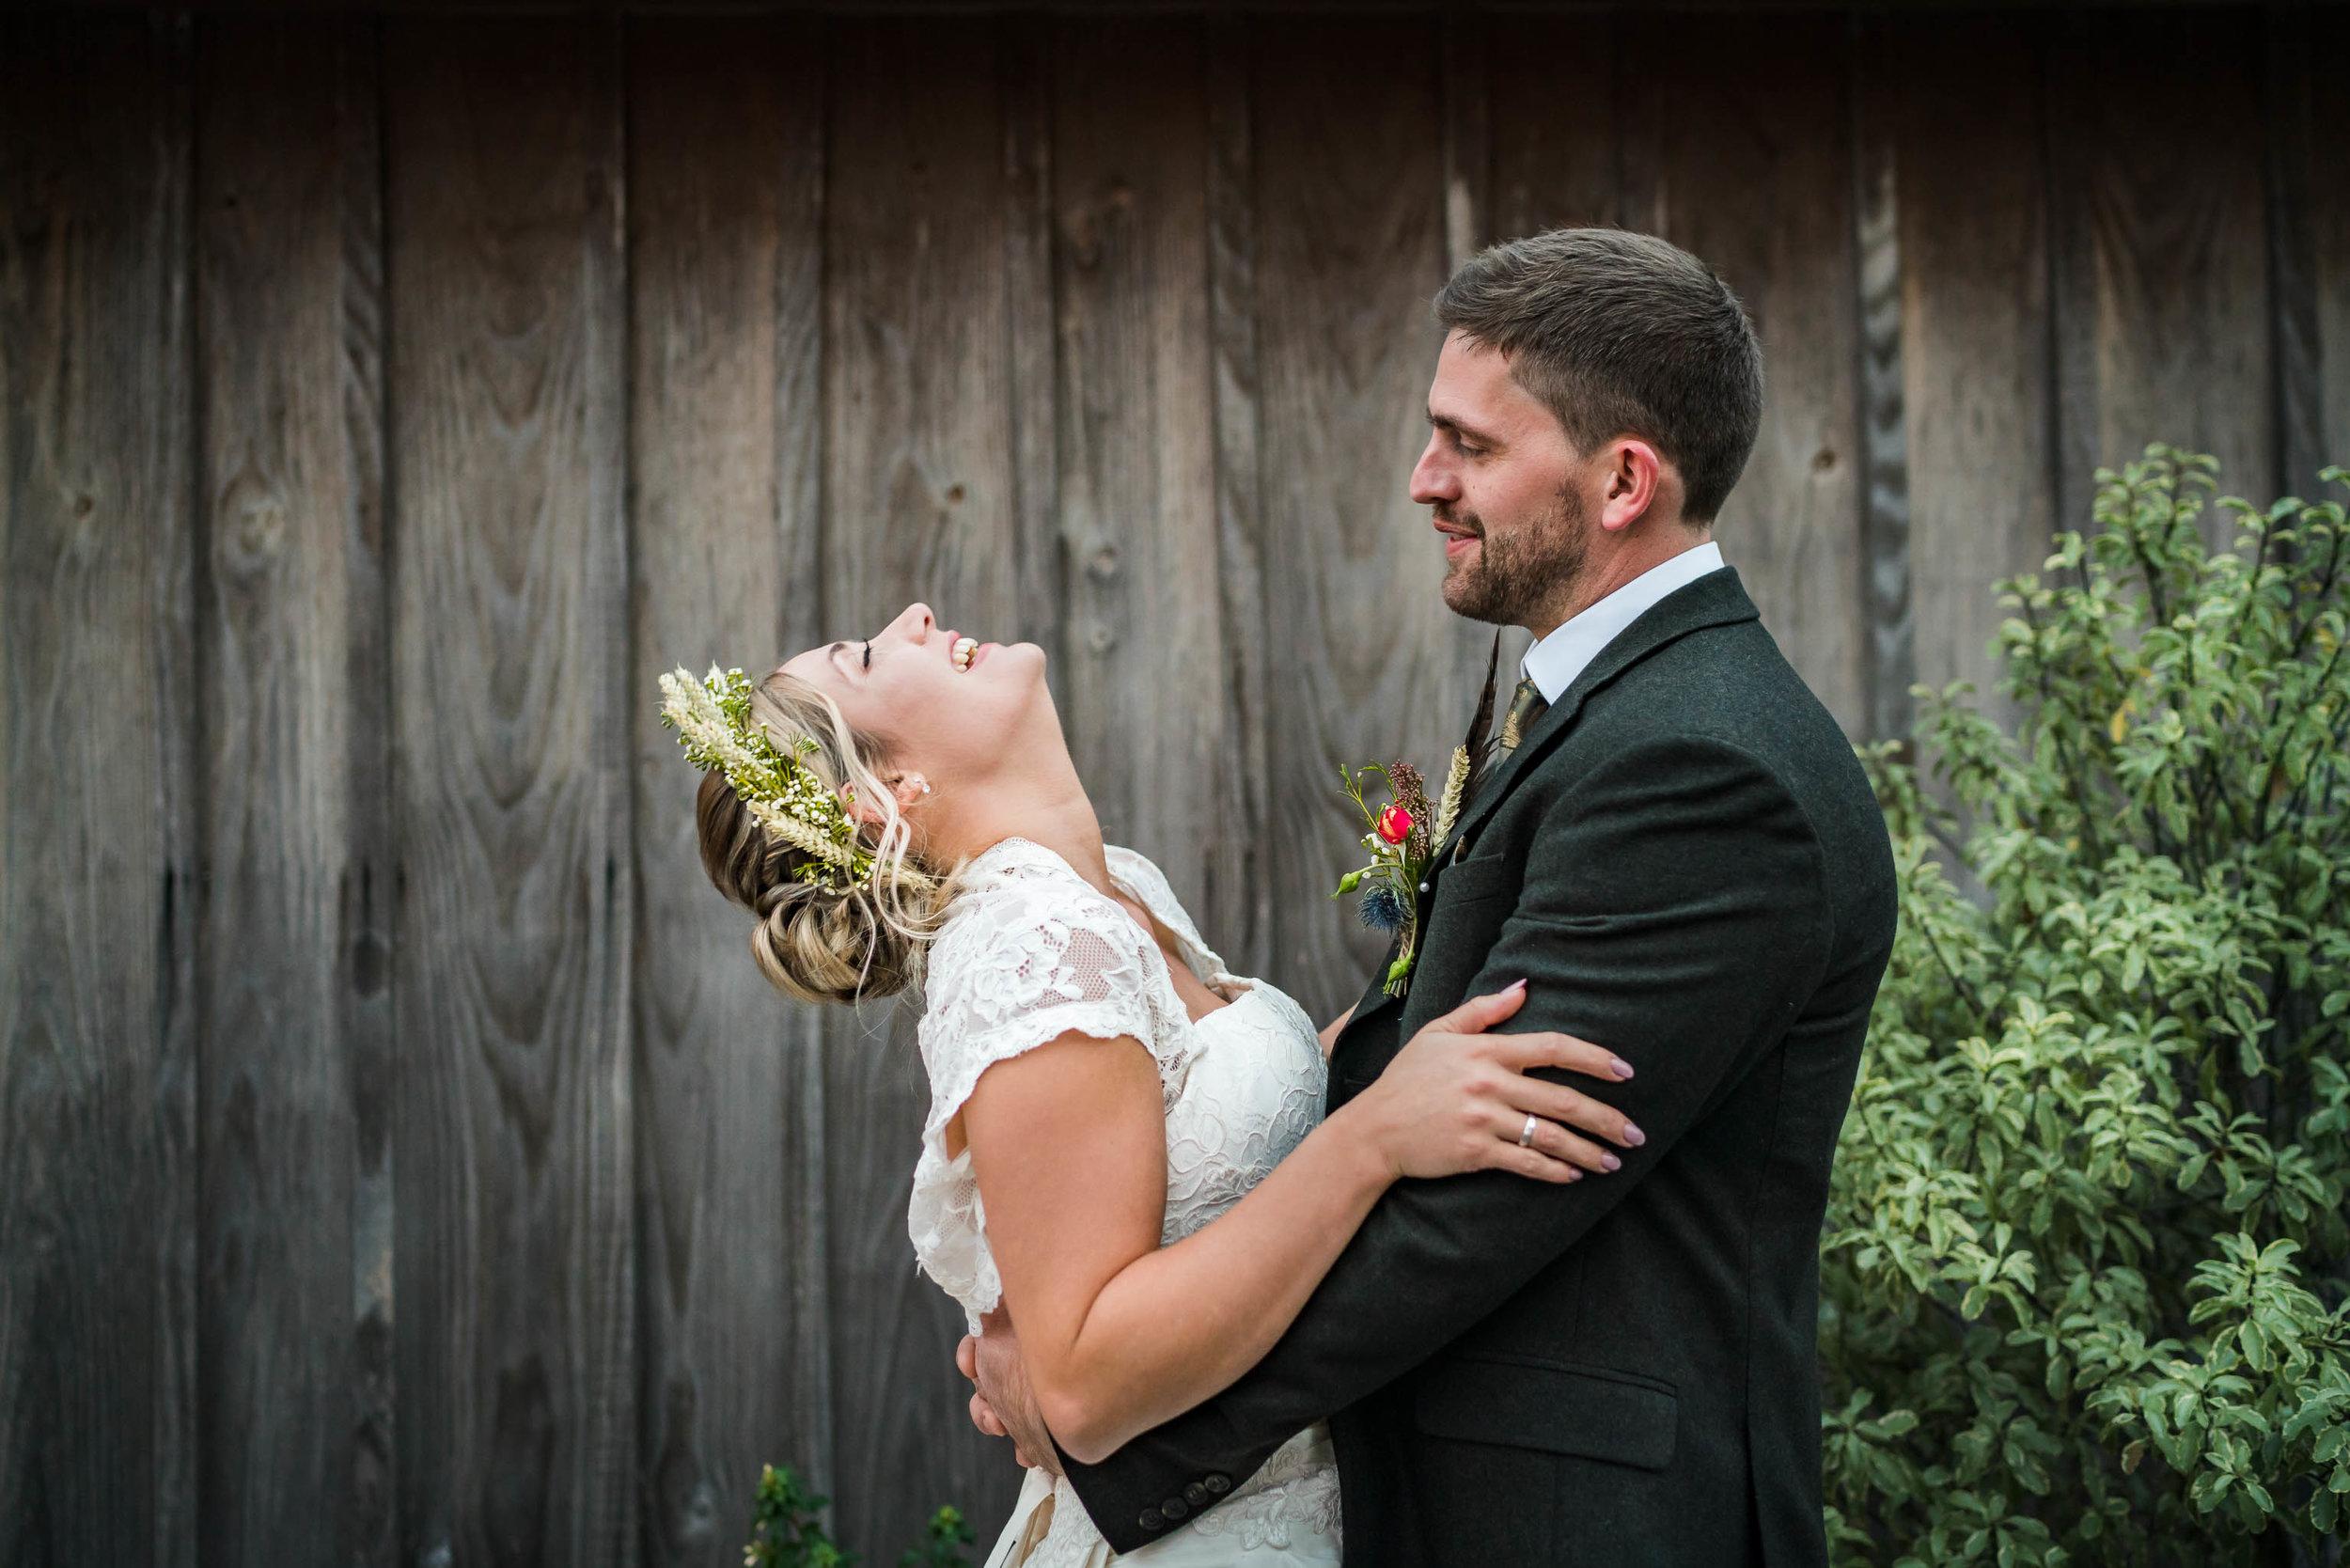 NC-2018-10-07_alex-and-nick-wedding-2637.jpg